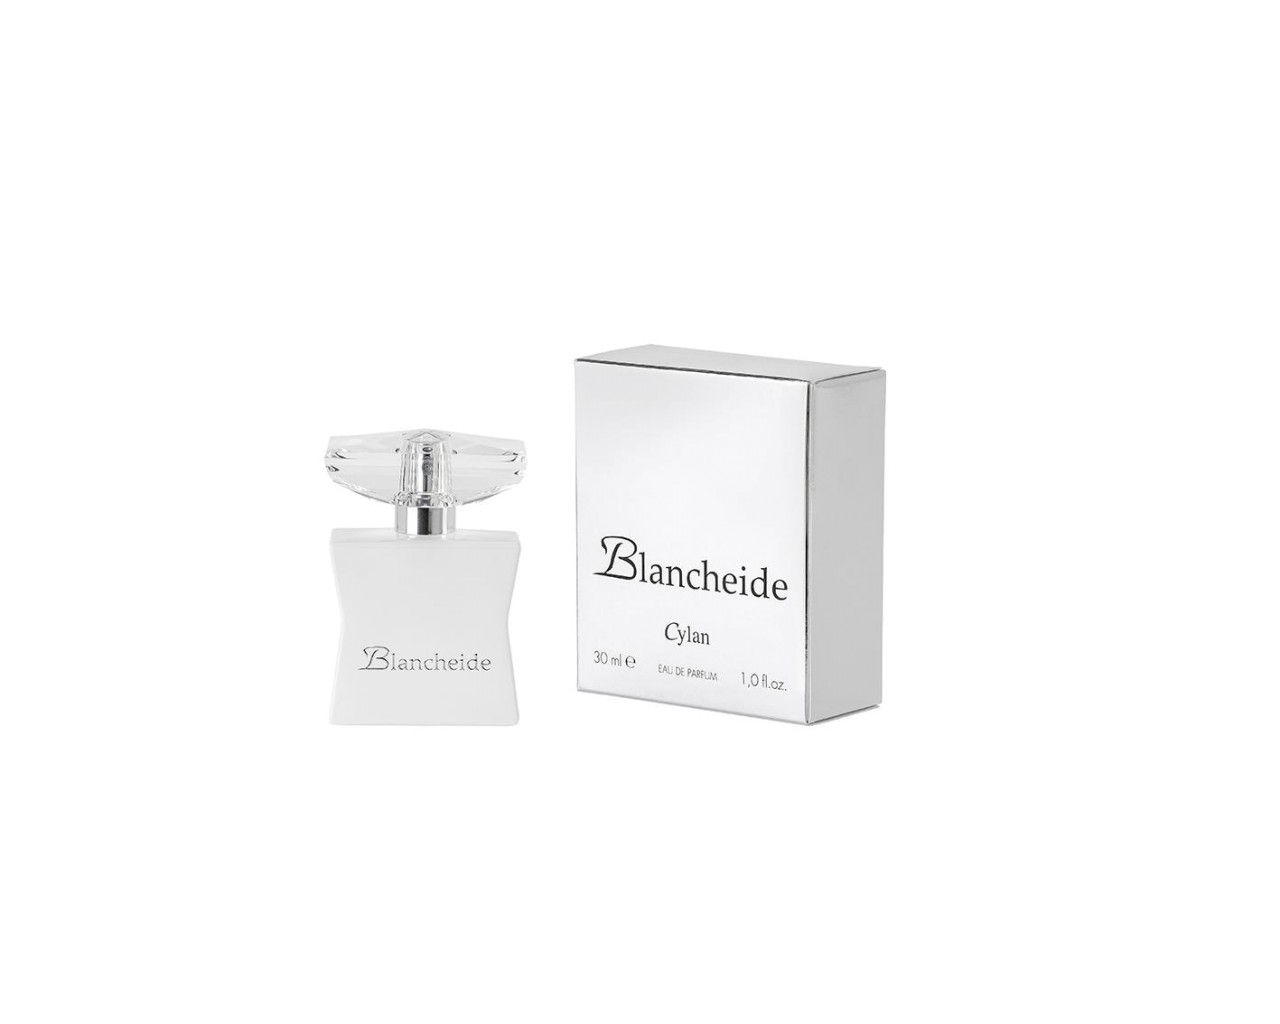 CYLAN BLANCHEIDE EDP 30 ML Blancheide BLAV30CY-01